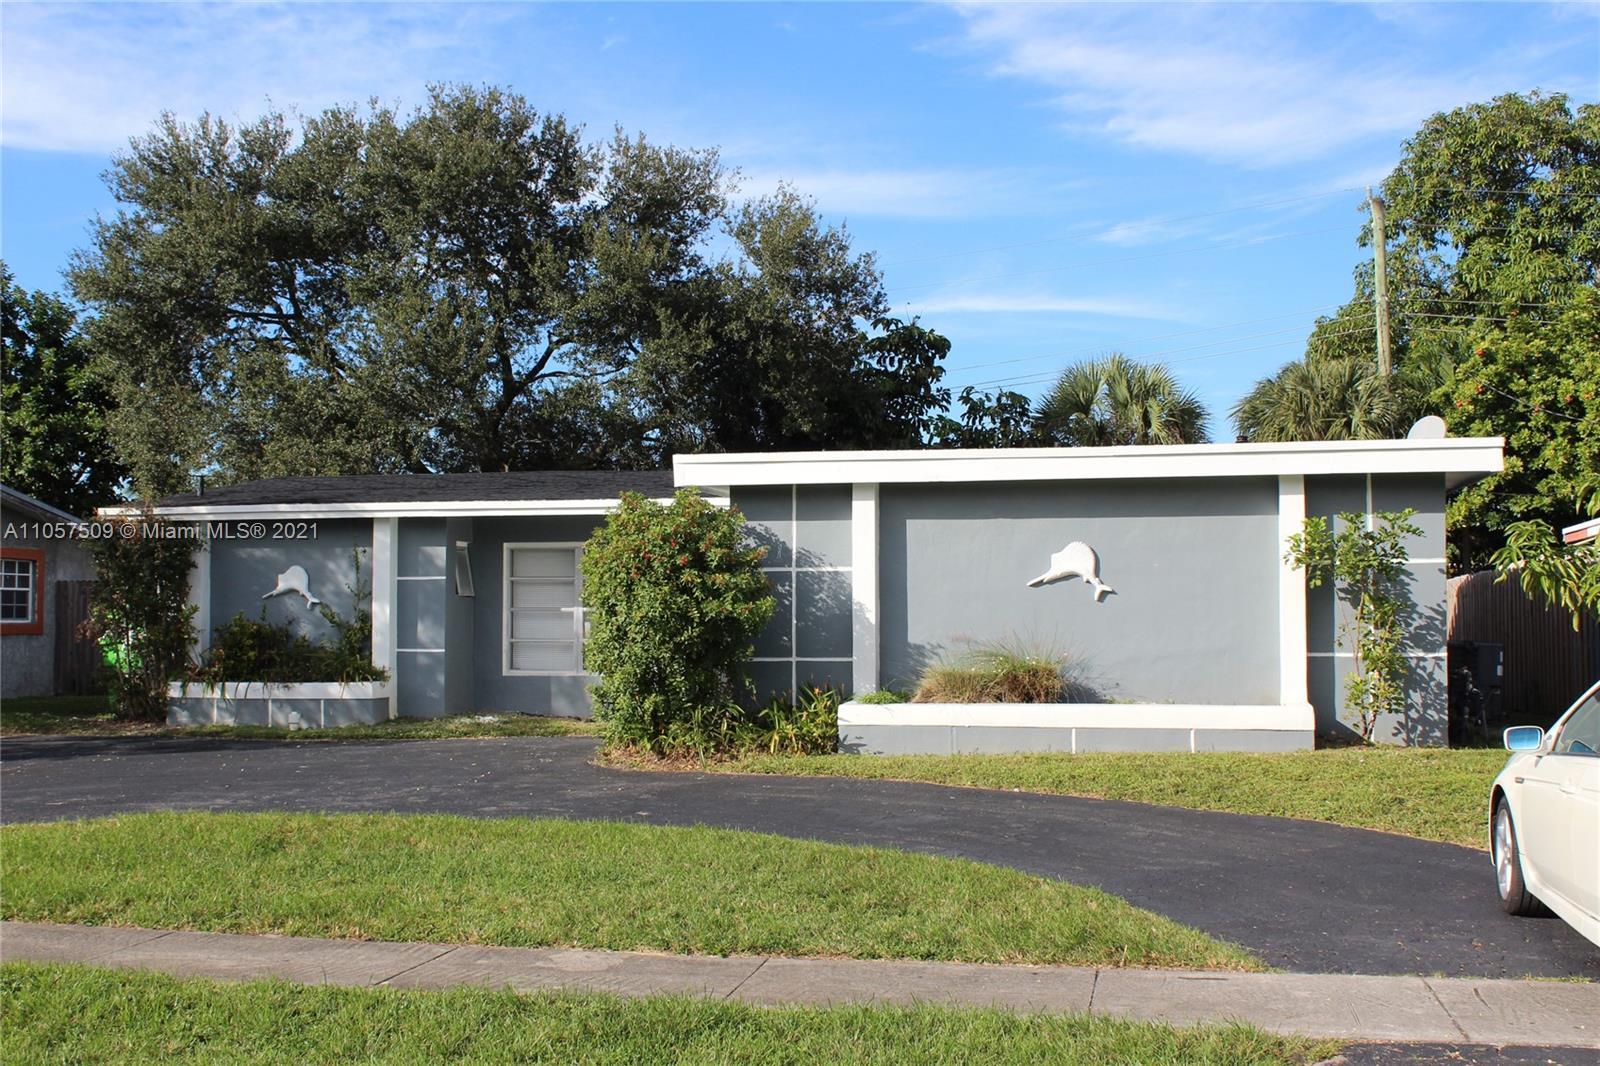 Sunrise Golf Village - 6481 NW 28th St, Sunrise, FL 33313